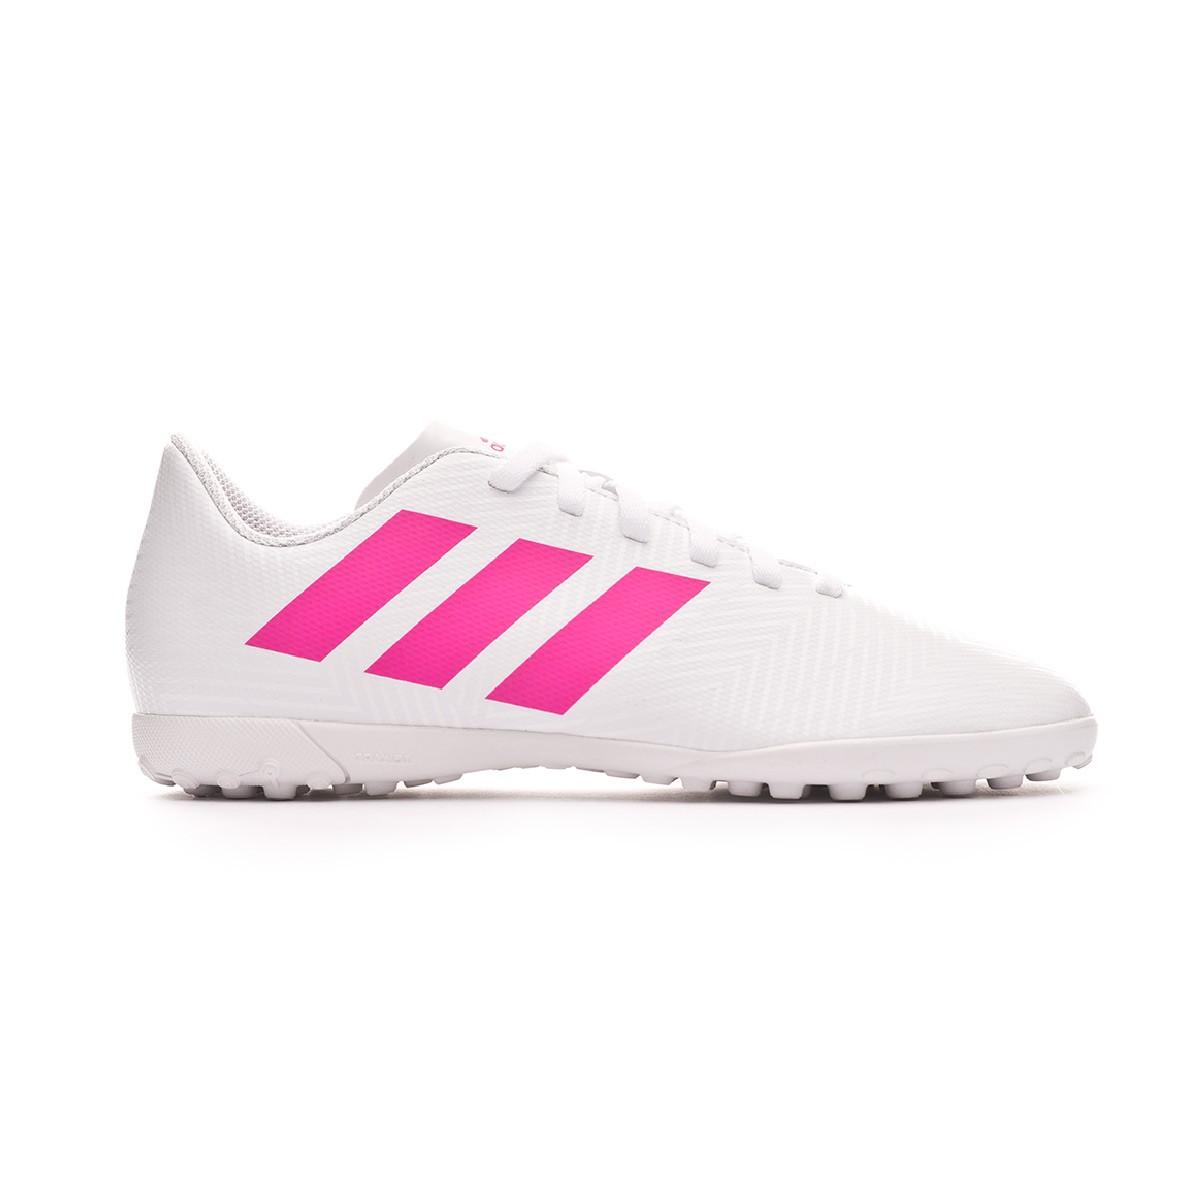 Chaussures Football Crampons Moulés Enfant Adidas Nemeziz messi jr 18.4 fg